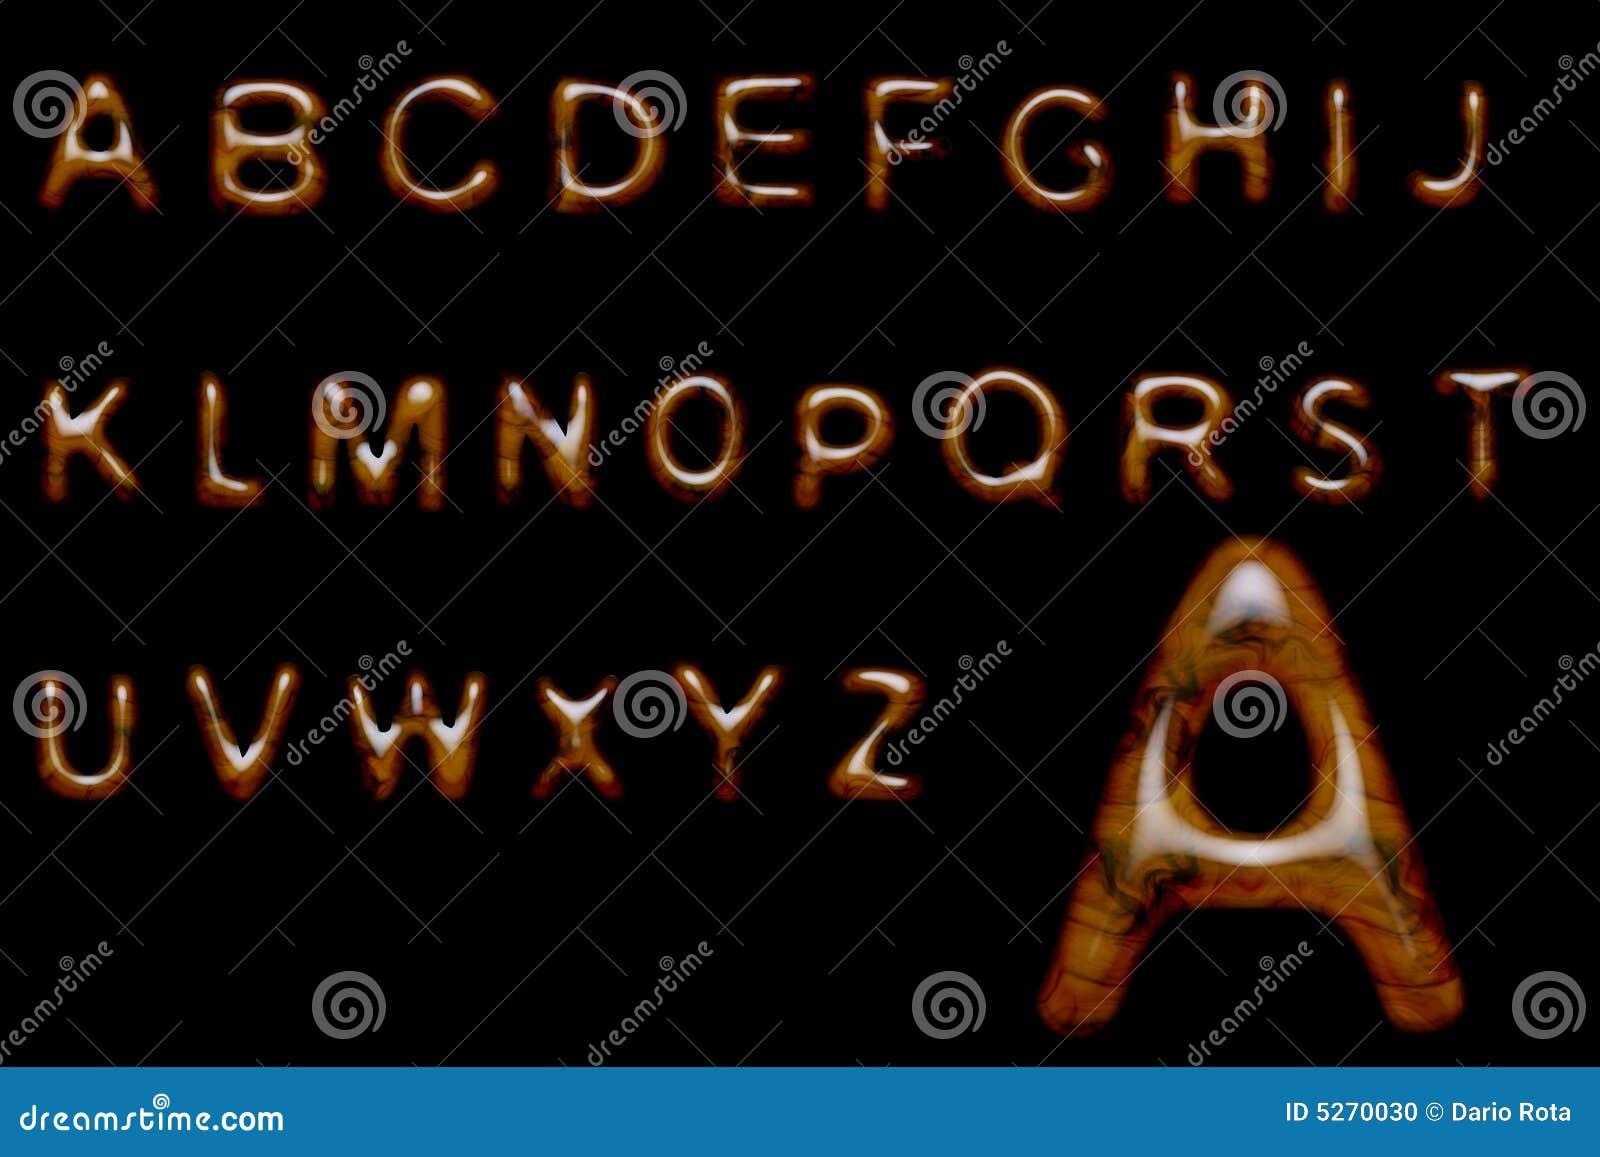 Glossy wood alphabet